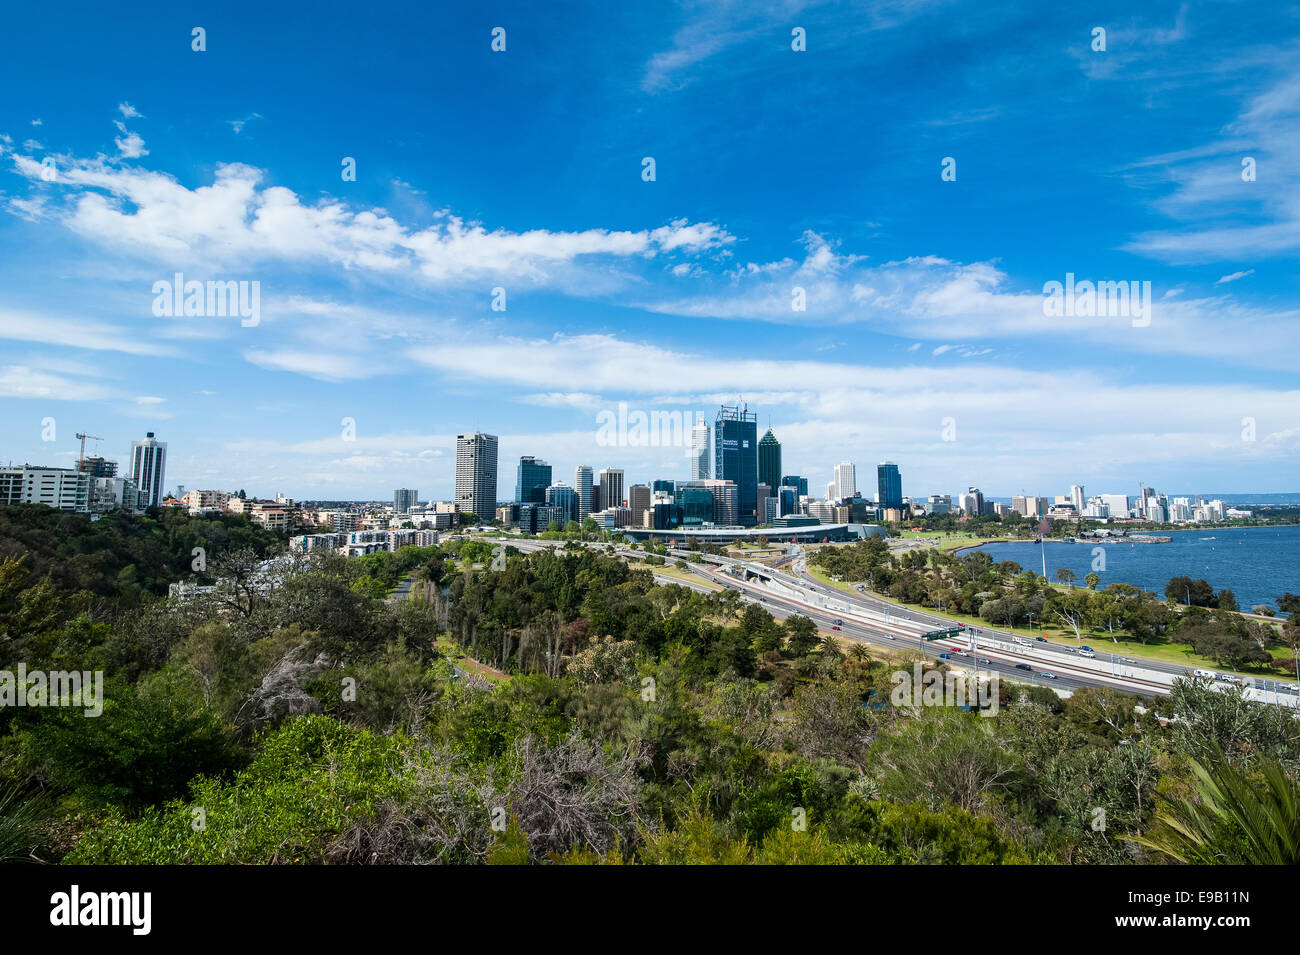 The skyline of Perth, Western Australia - Stock Image